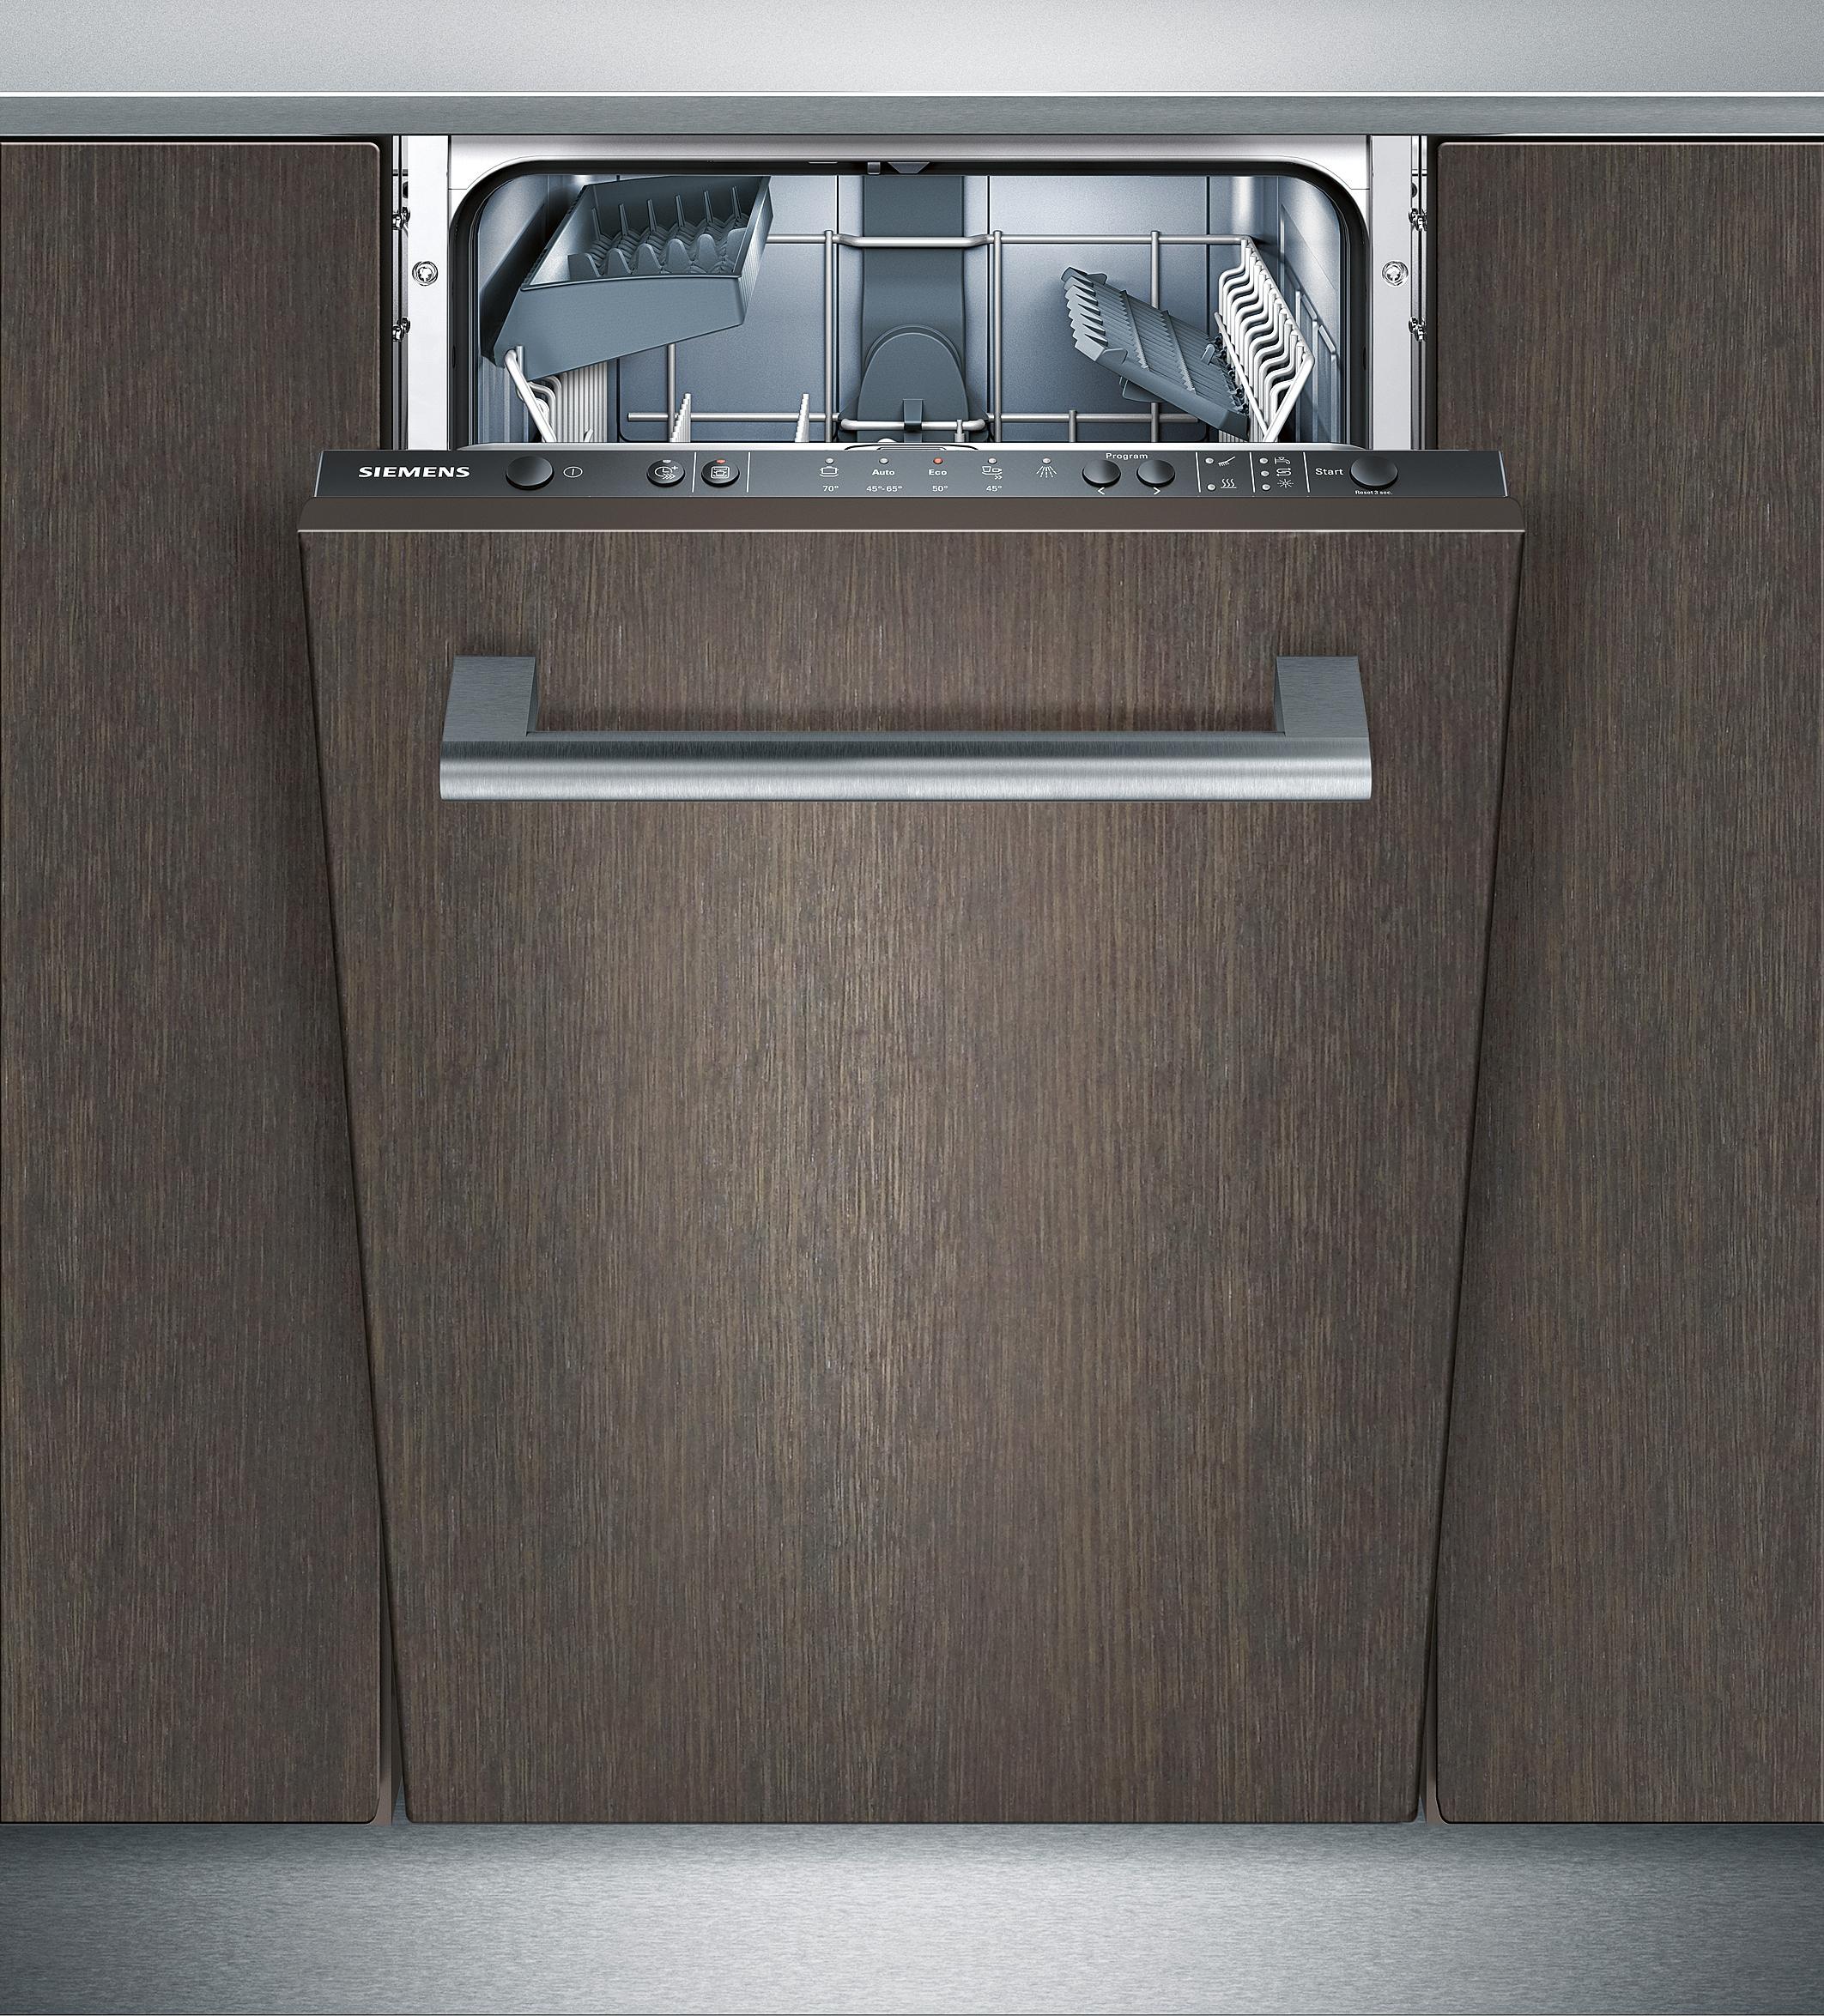 geschirrsp ler sr65e007eu speedmatic45 geschirrsp ler 45. Black Bedroom Furniture Sets. Home Design Ideas